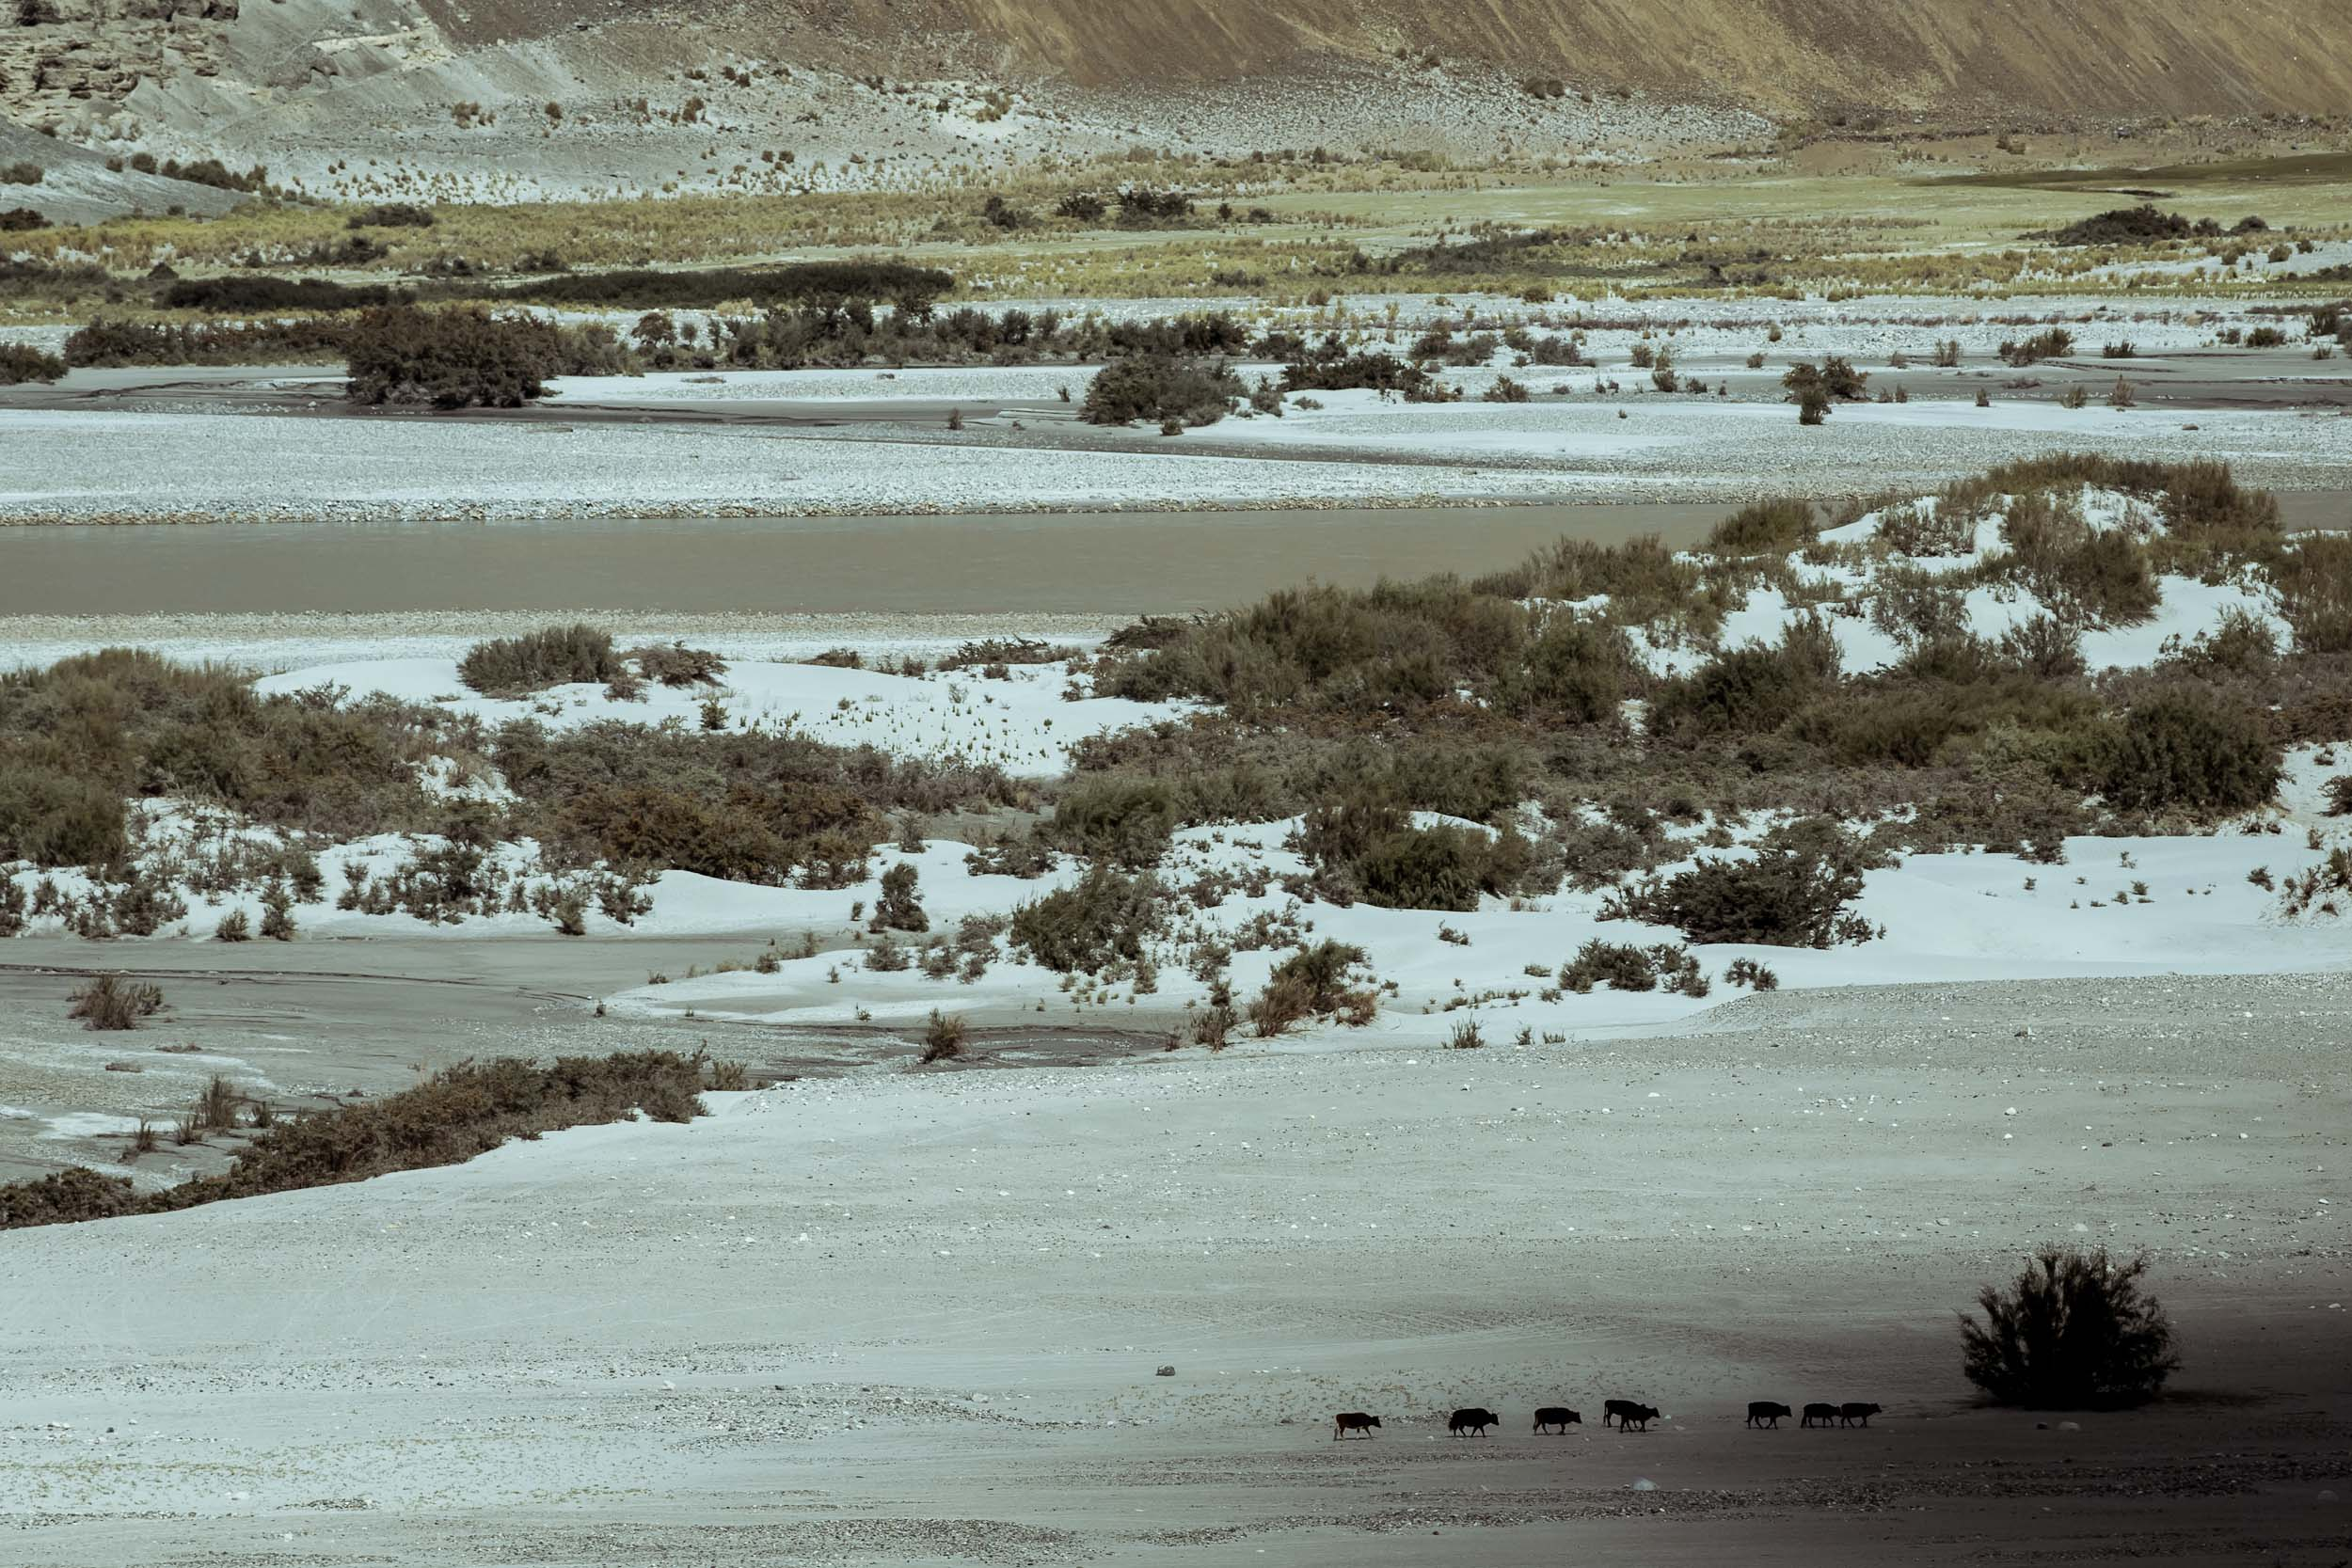 Sindhur_Photography_Travel_Landscape_Ladakh-8.JPG